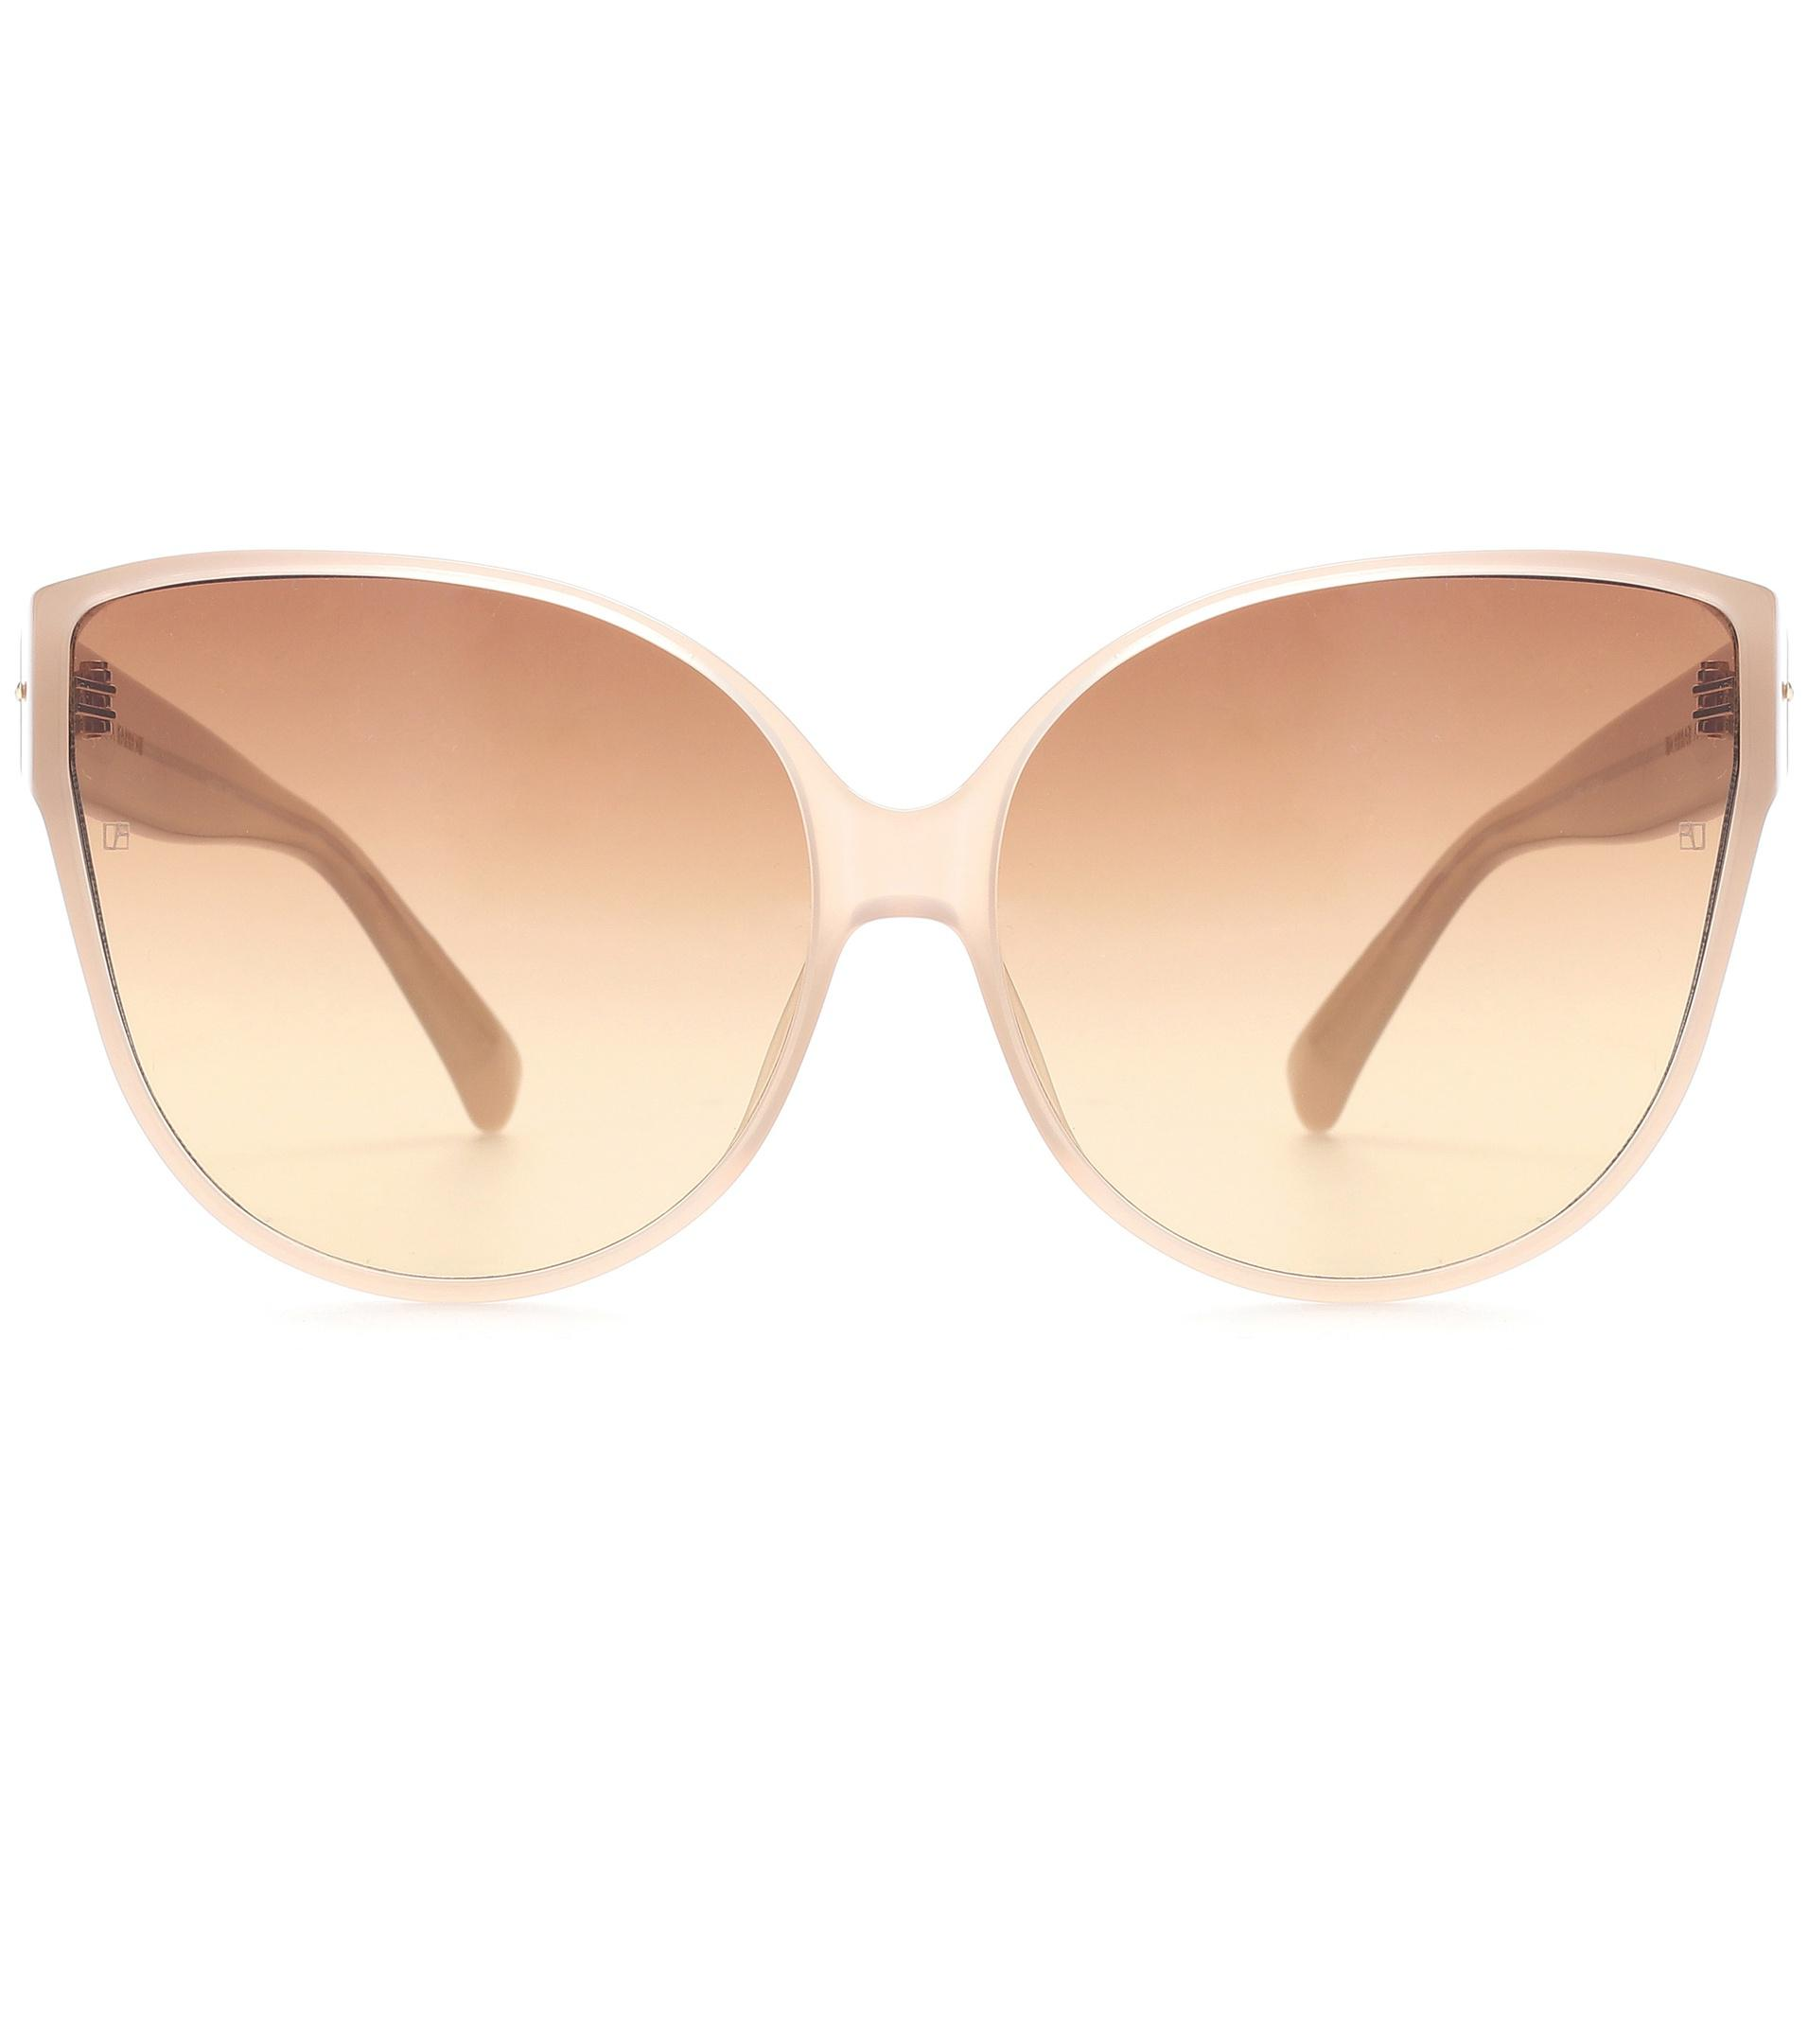 ba33b39813 Lyst - Linda Farrow Oversized Cat-eye Sunglasses in Brown